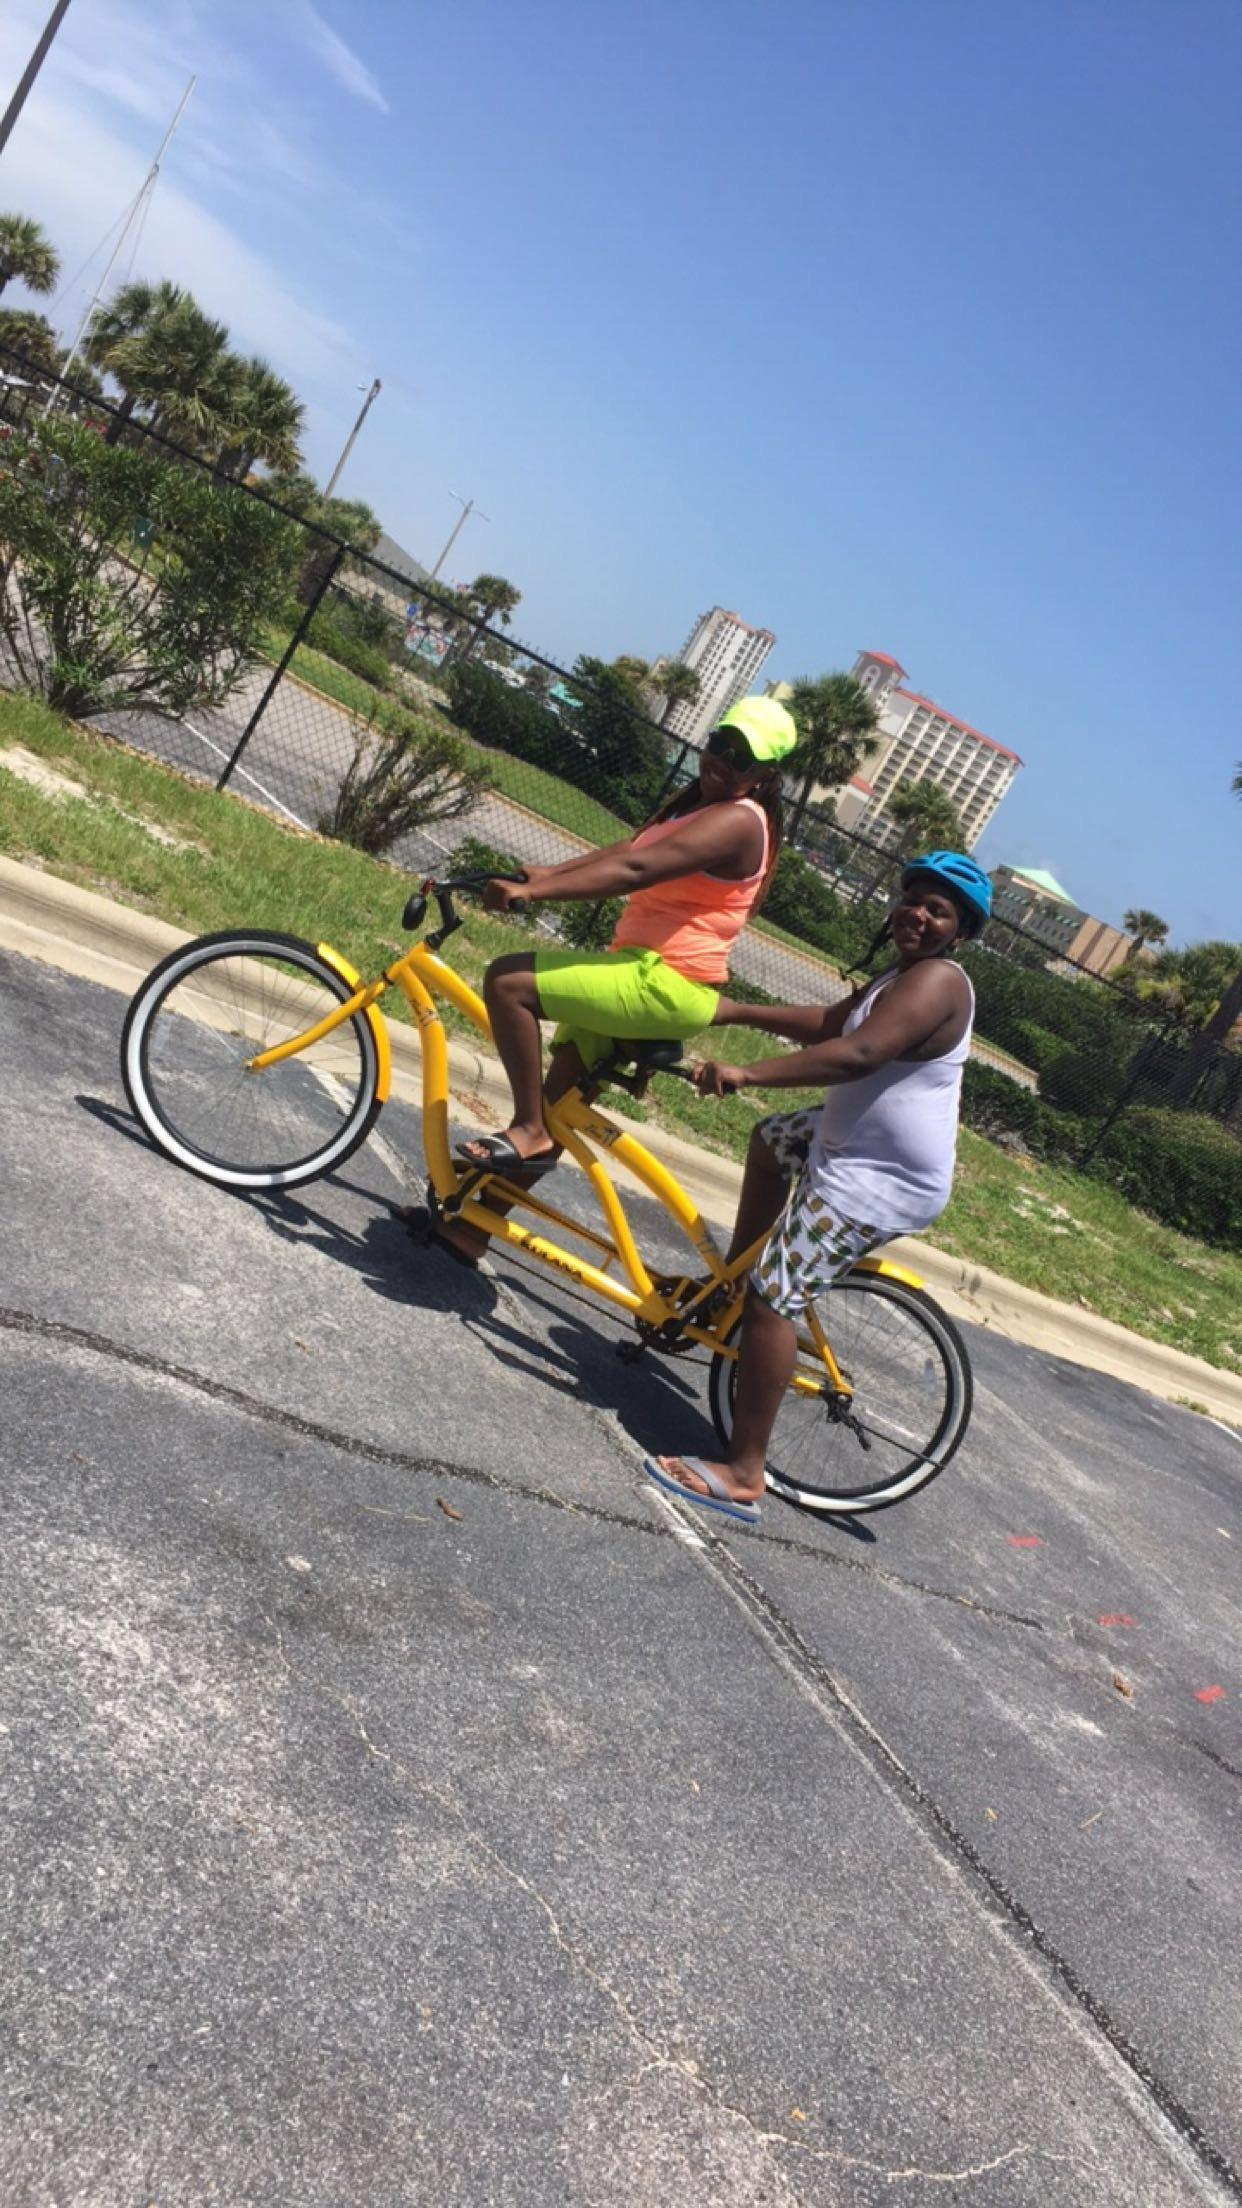 Free bike rentals